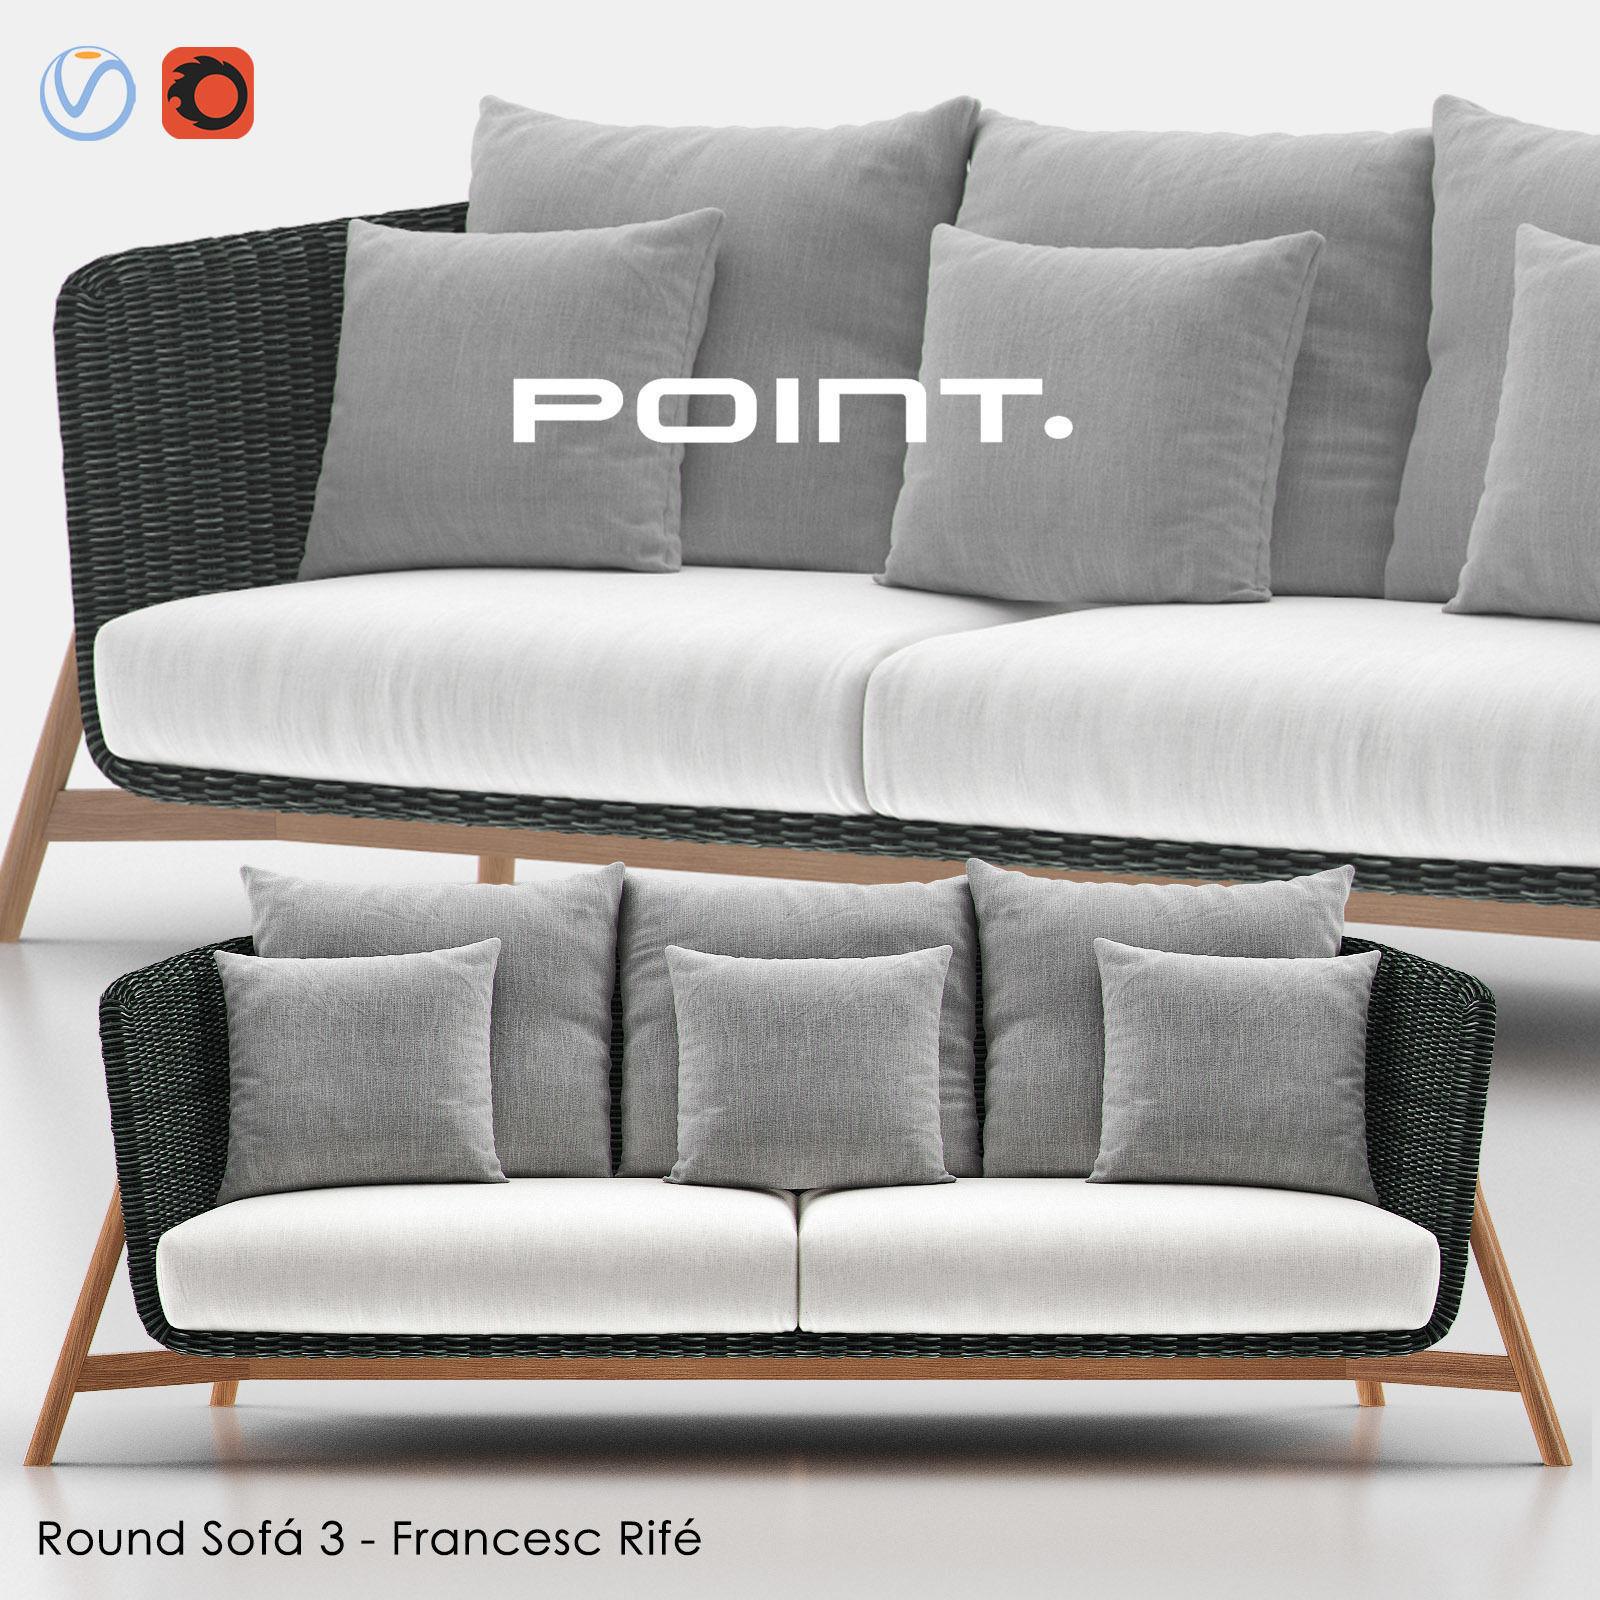 Round Sofa 3 - Point